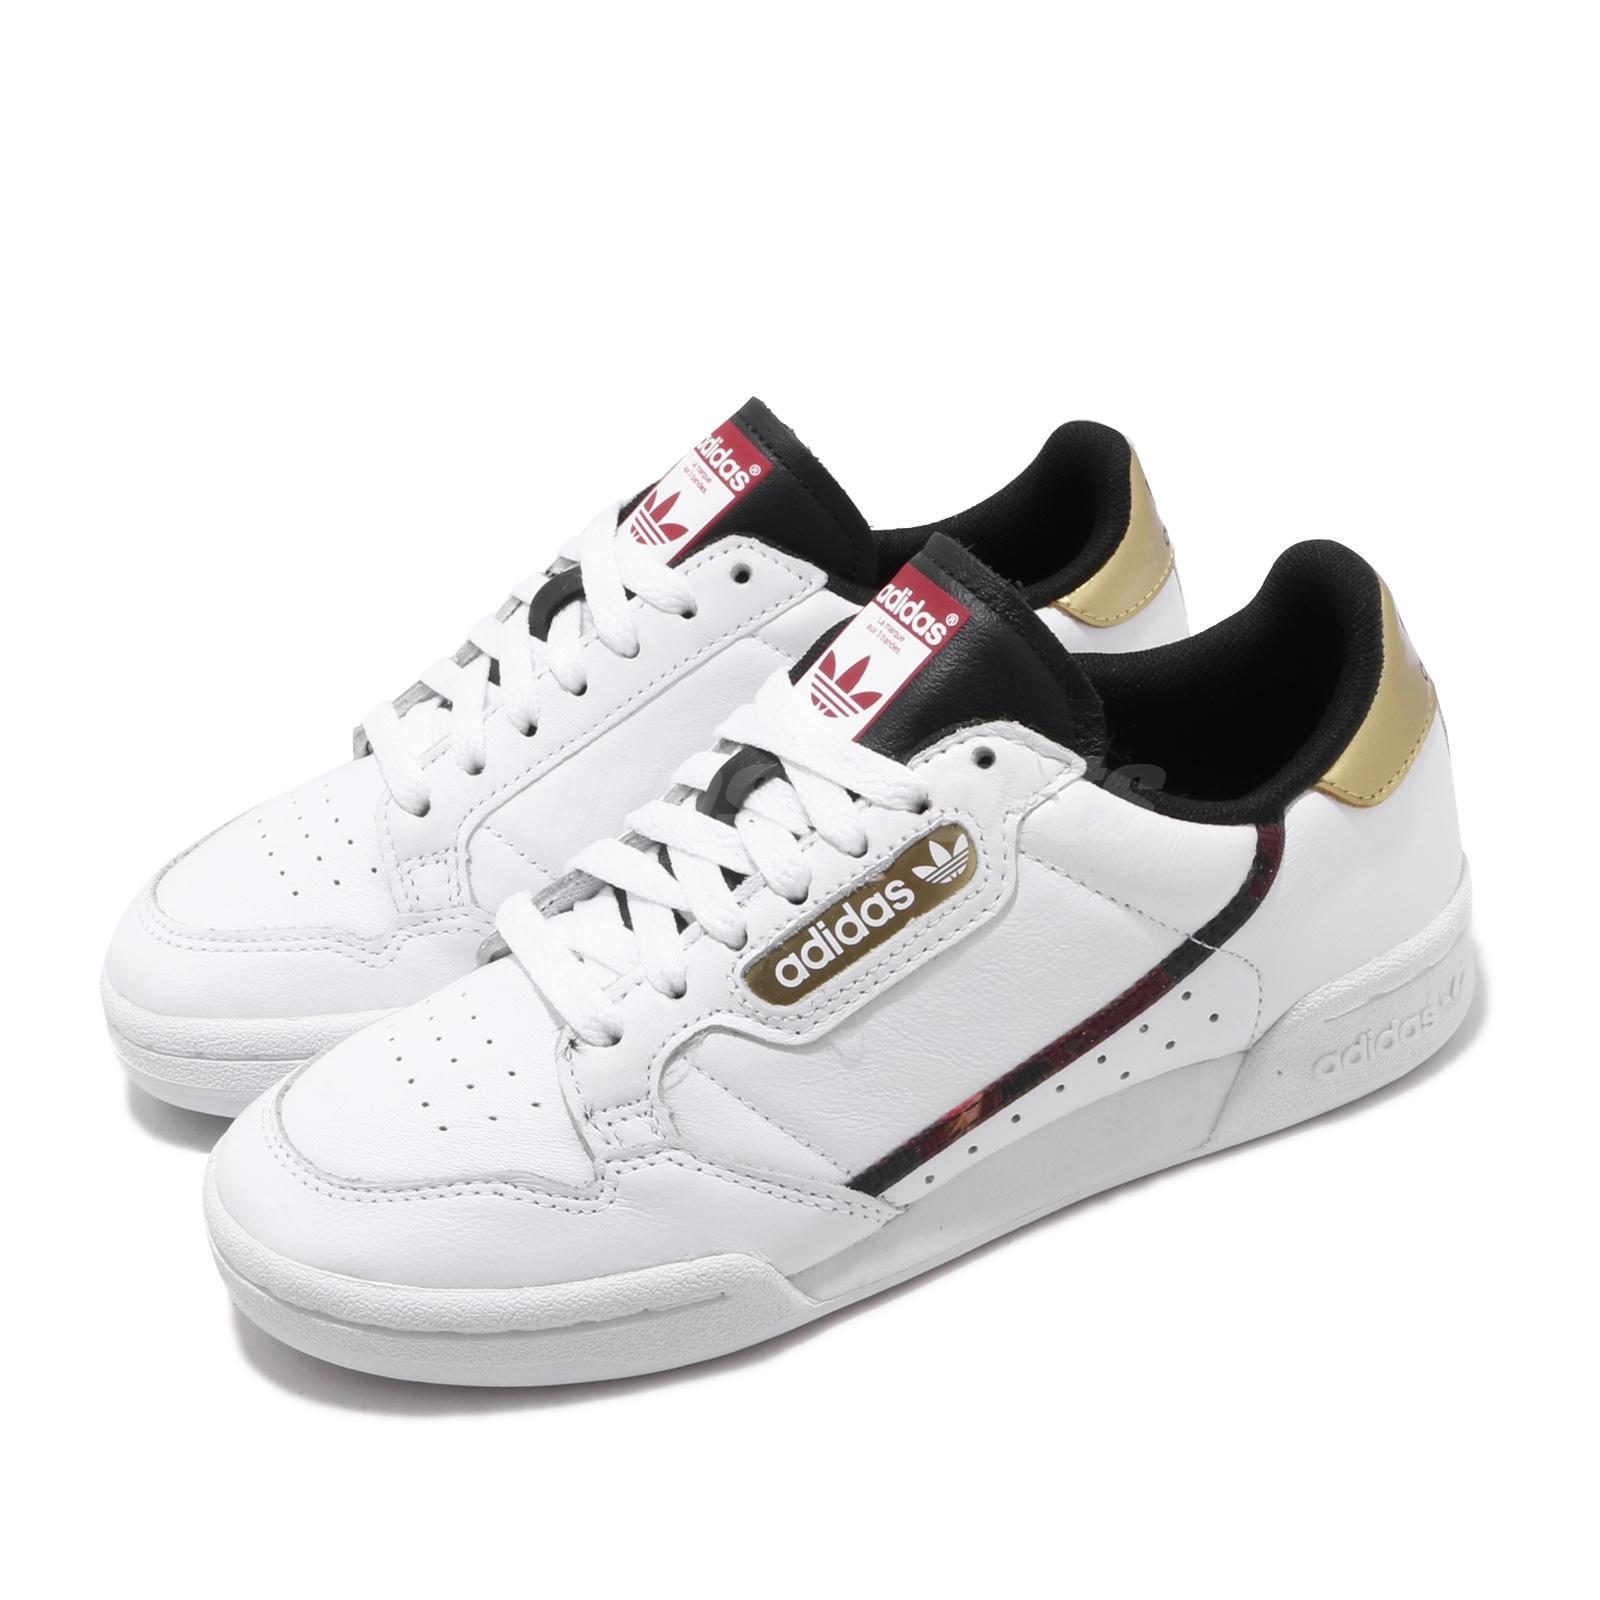 Details about adidas Originals Continental 80 White Gold Men Women  Lifestyle Shoes FW5325